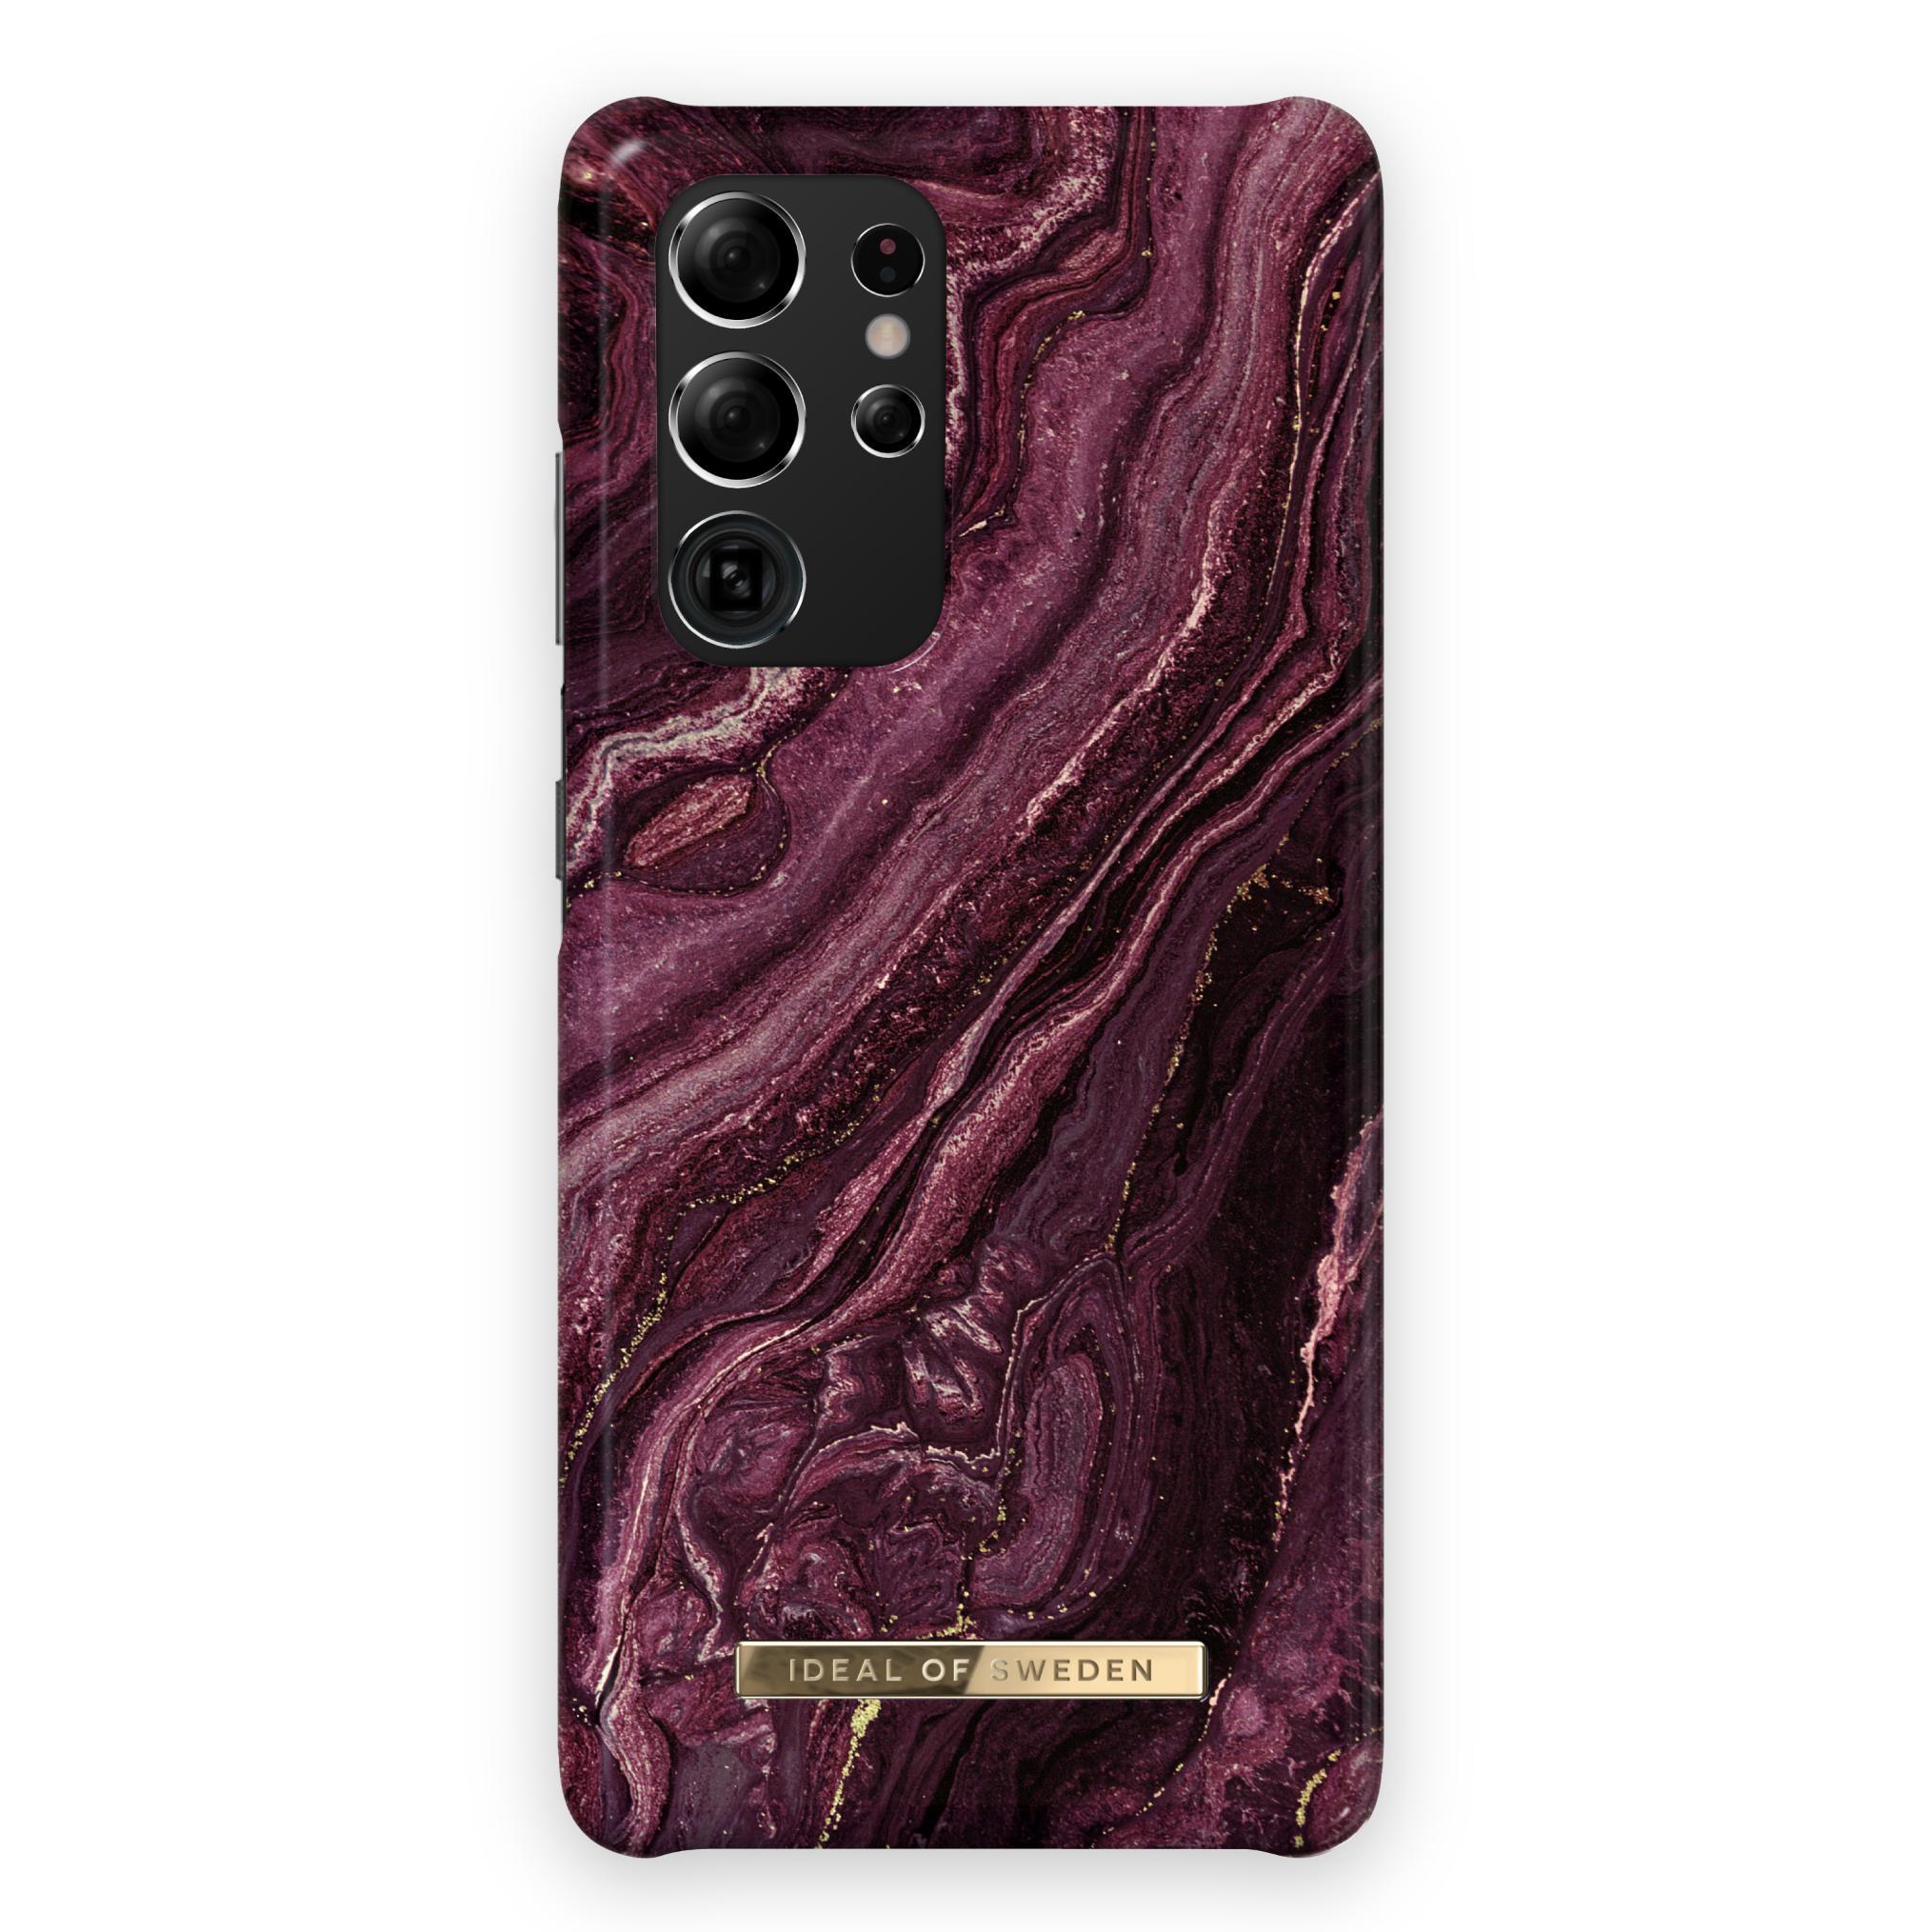 Fashion Case Galaxy S21 Ultra Golden Plum